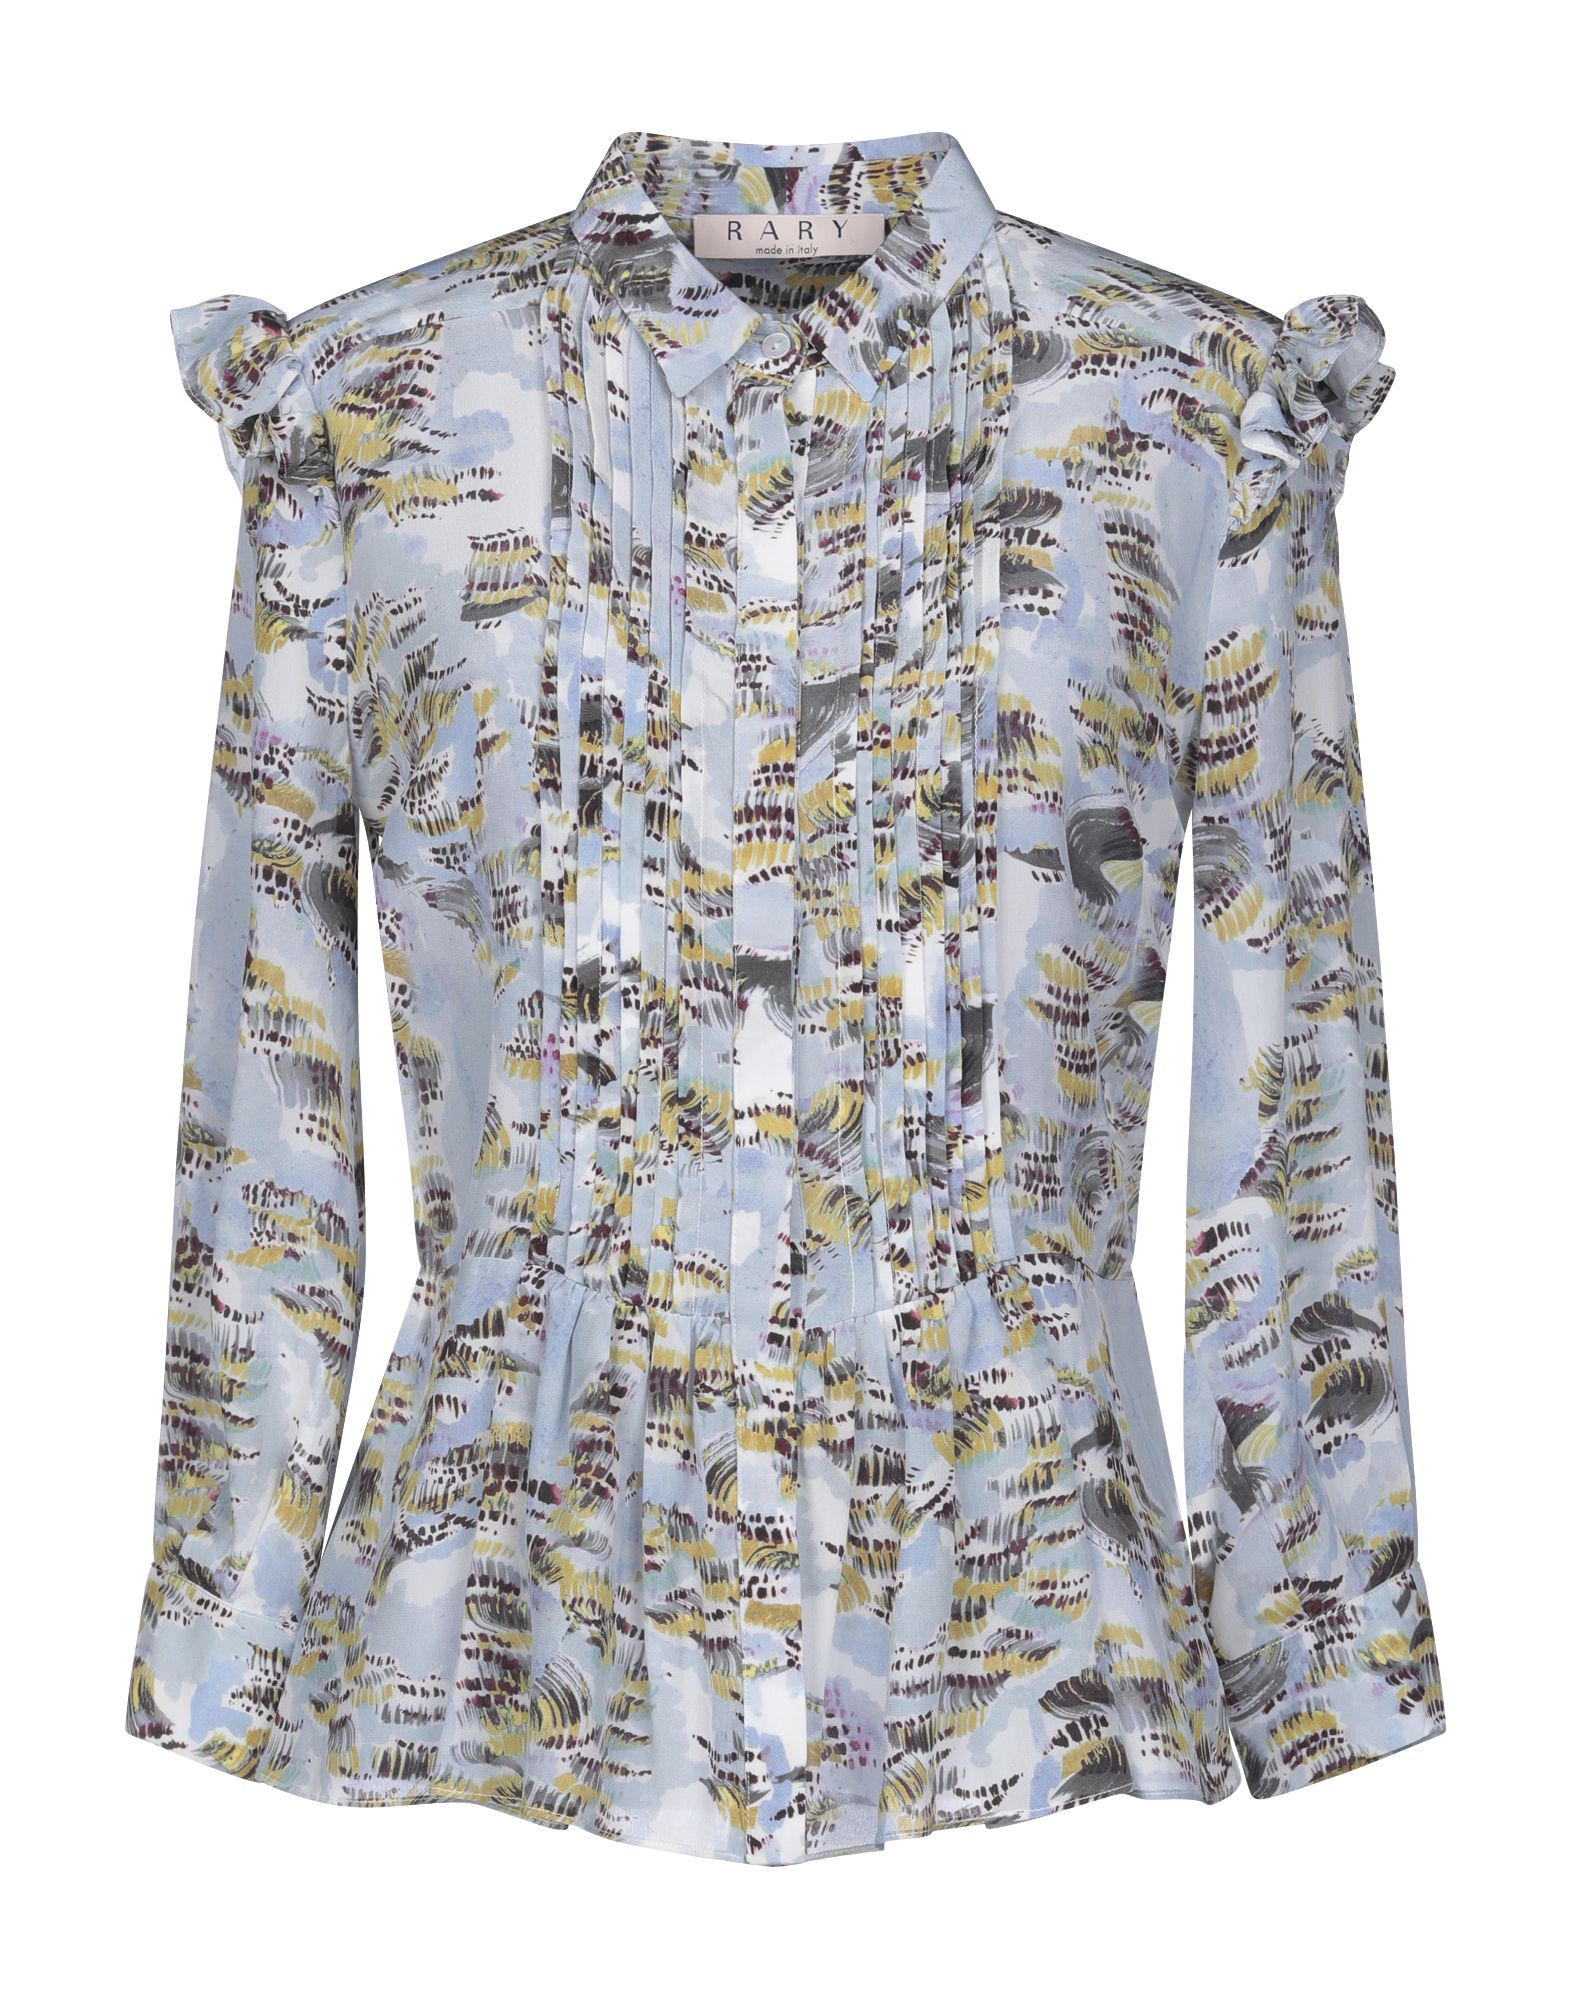 Camicie  E bluse Fantasia Fantasia Rary donna - 38791912PD  Rabatt-Verkauf